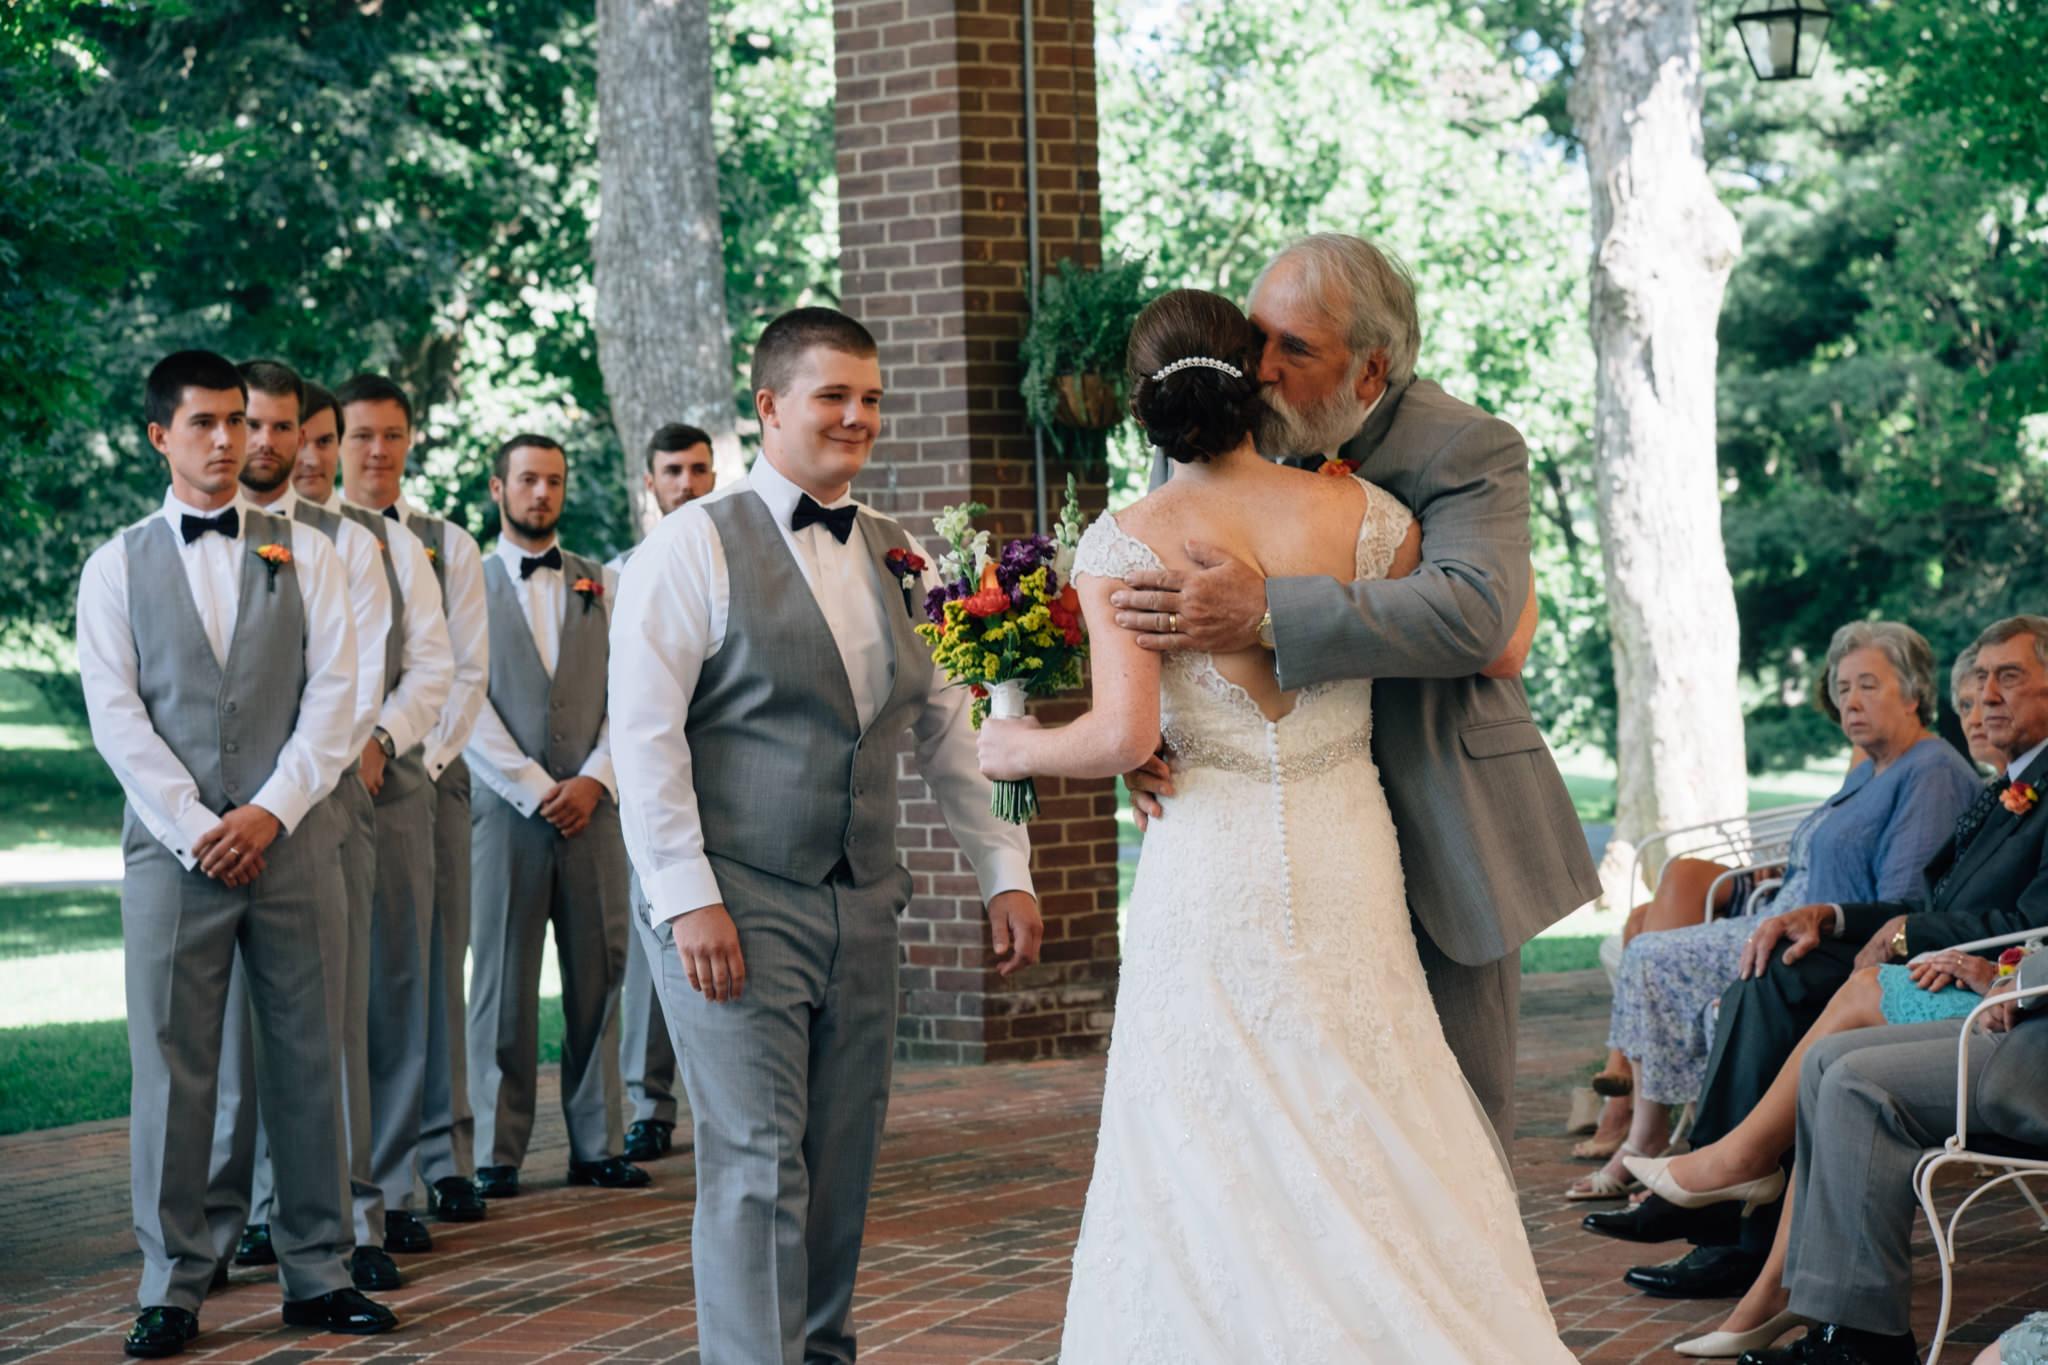 Jennifer&Drew_Wedding_Blog_046.jpg